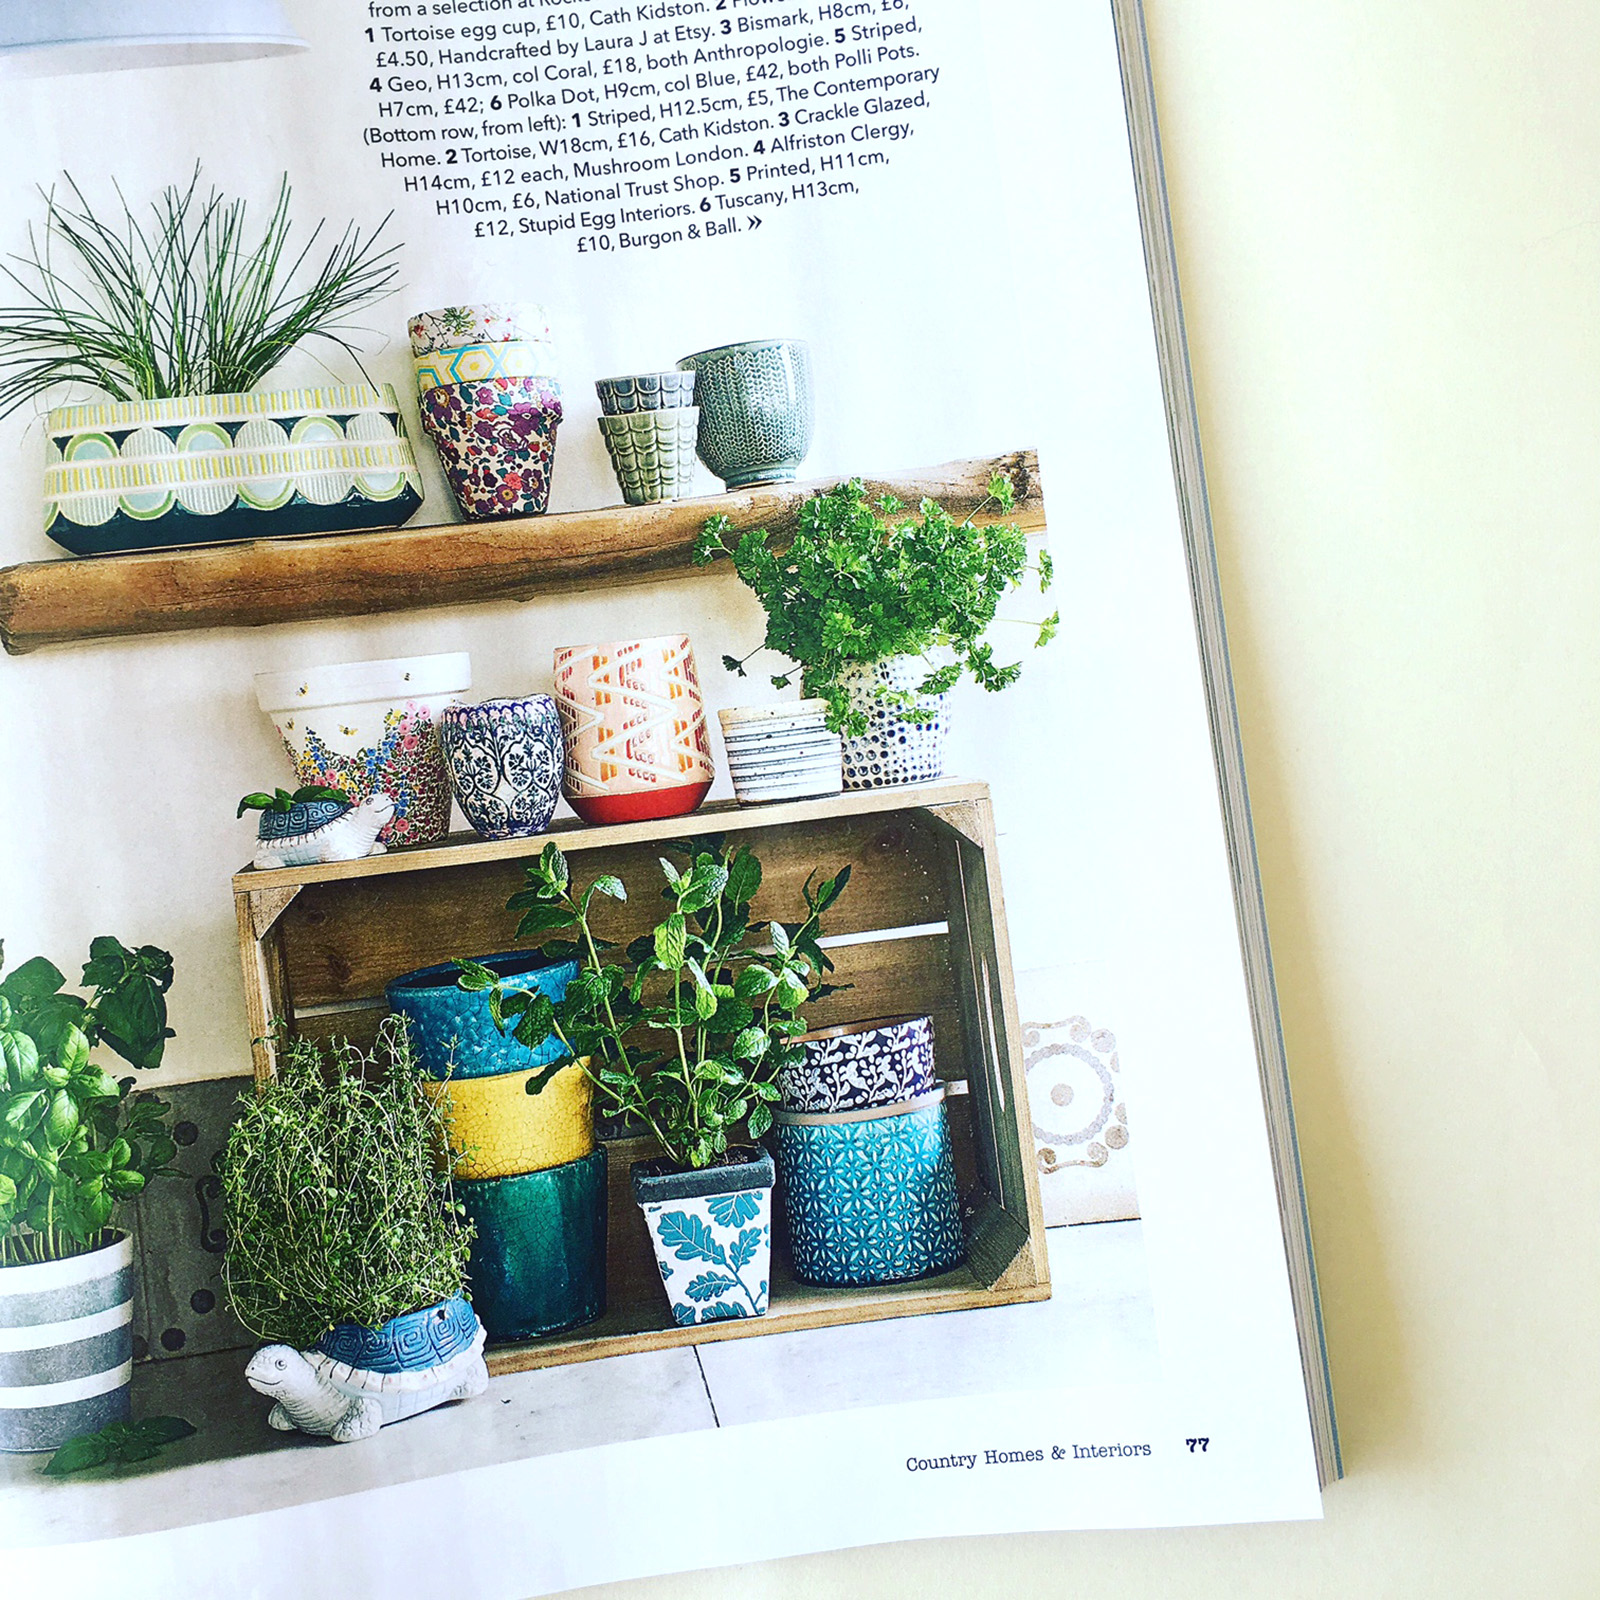 Country homes & interiors magazine Polli Pots planters 2.jpg